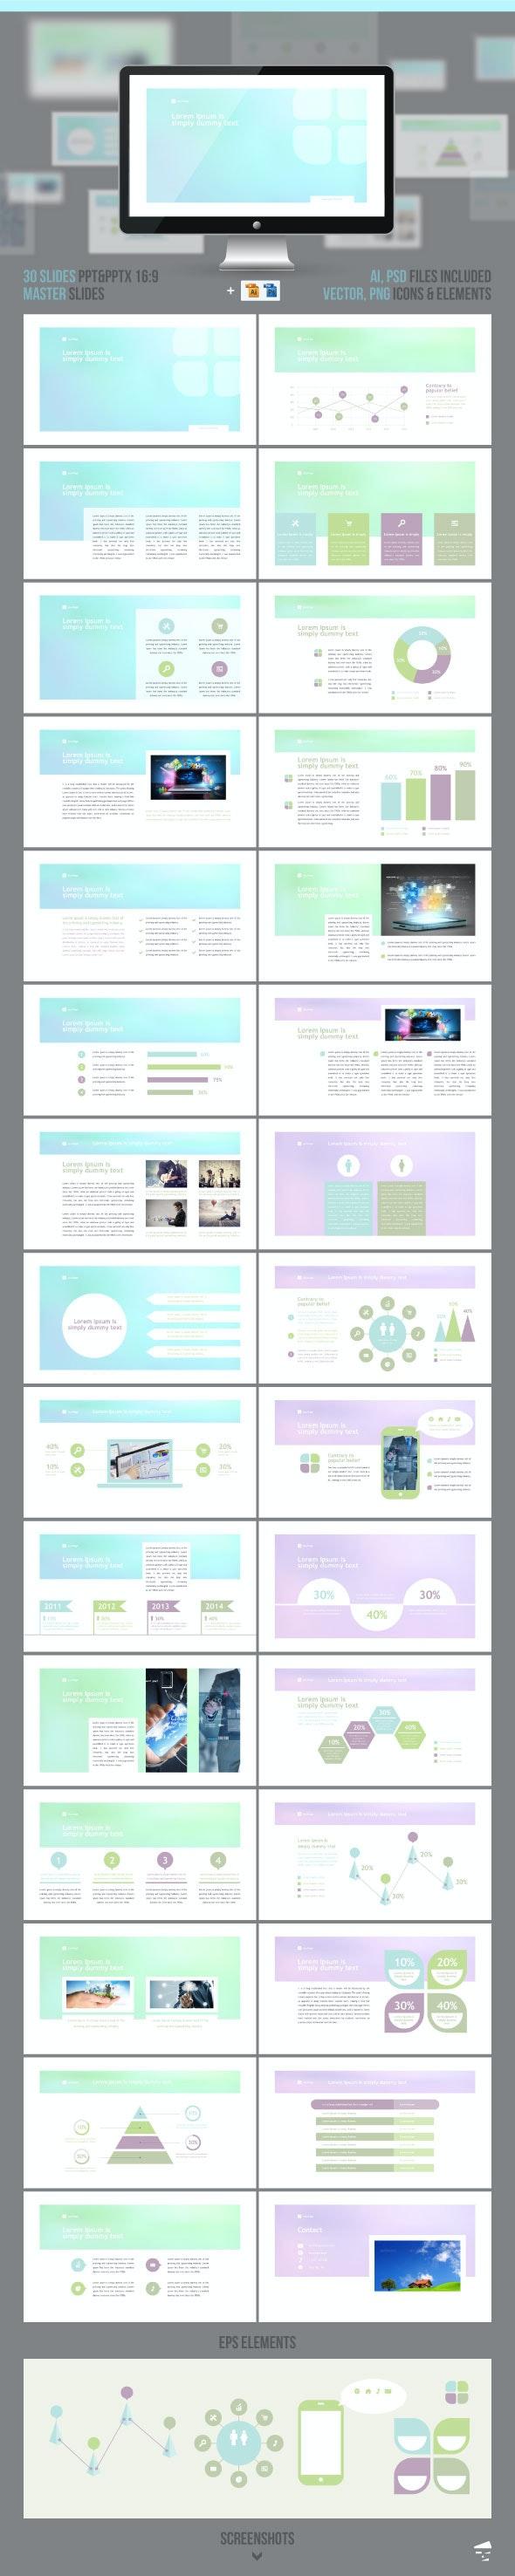 Presentation Application Developer - Business PowerPoint Templates